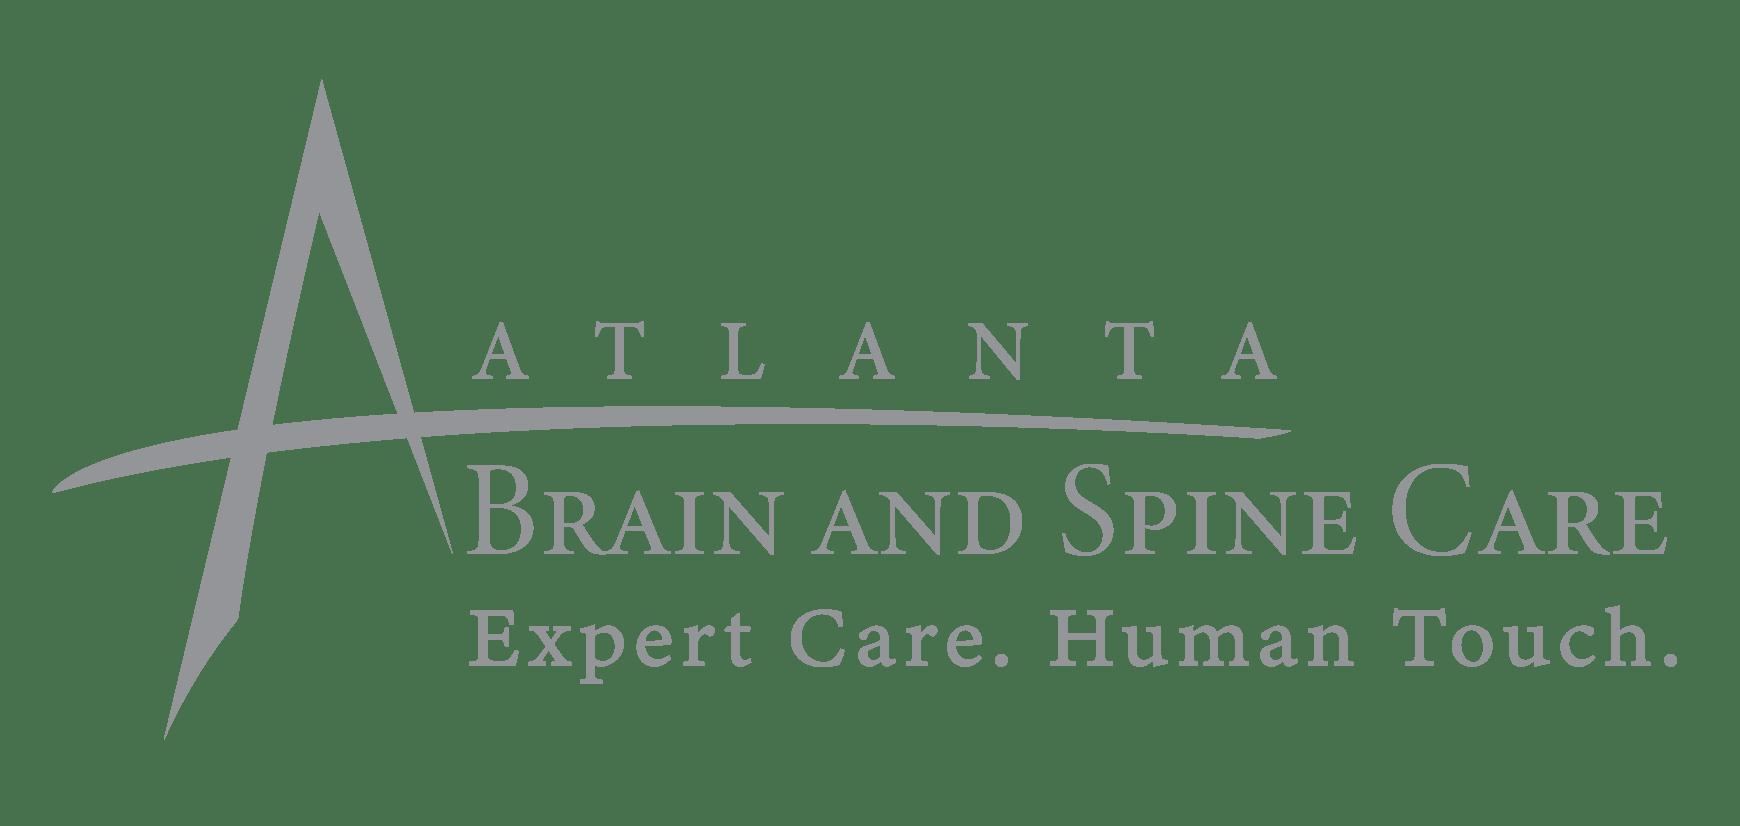 Atlanta Brain and Spine